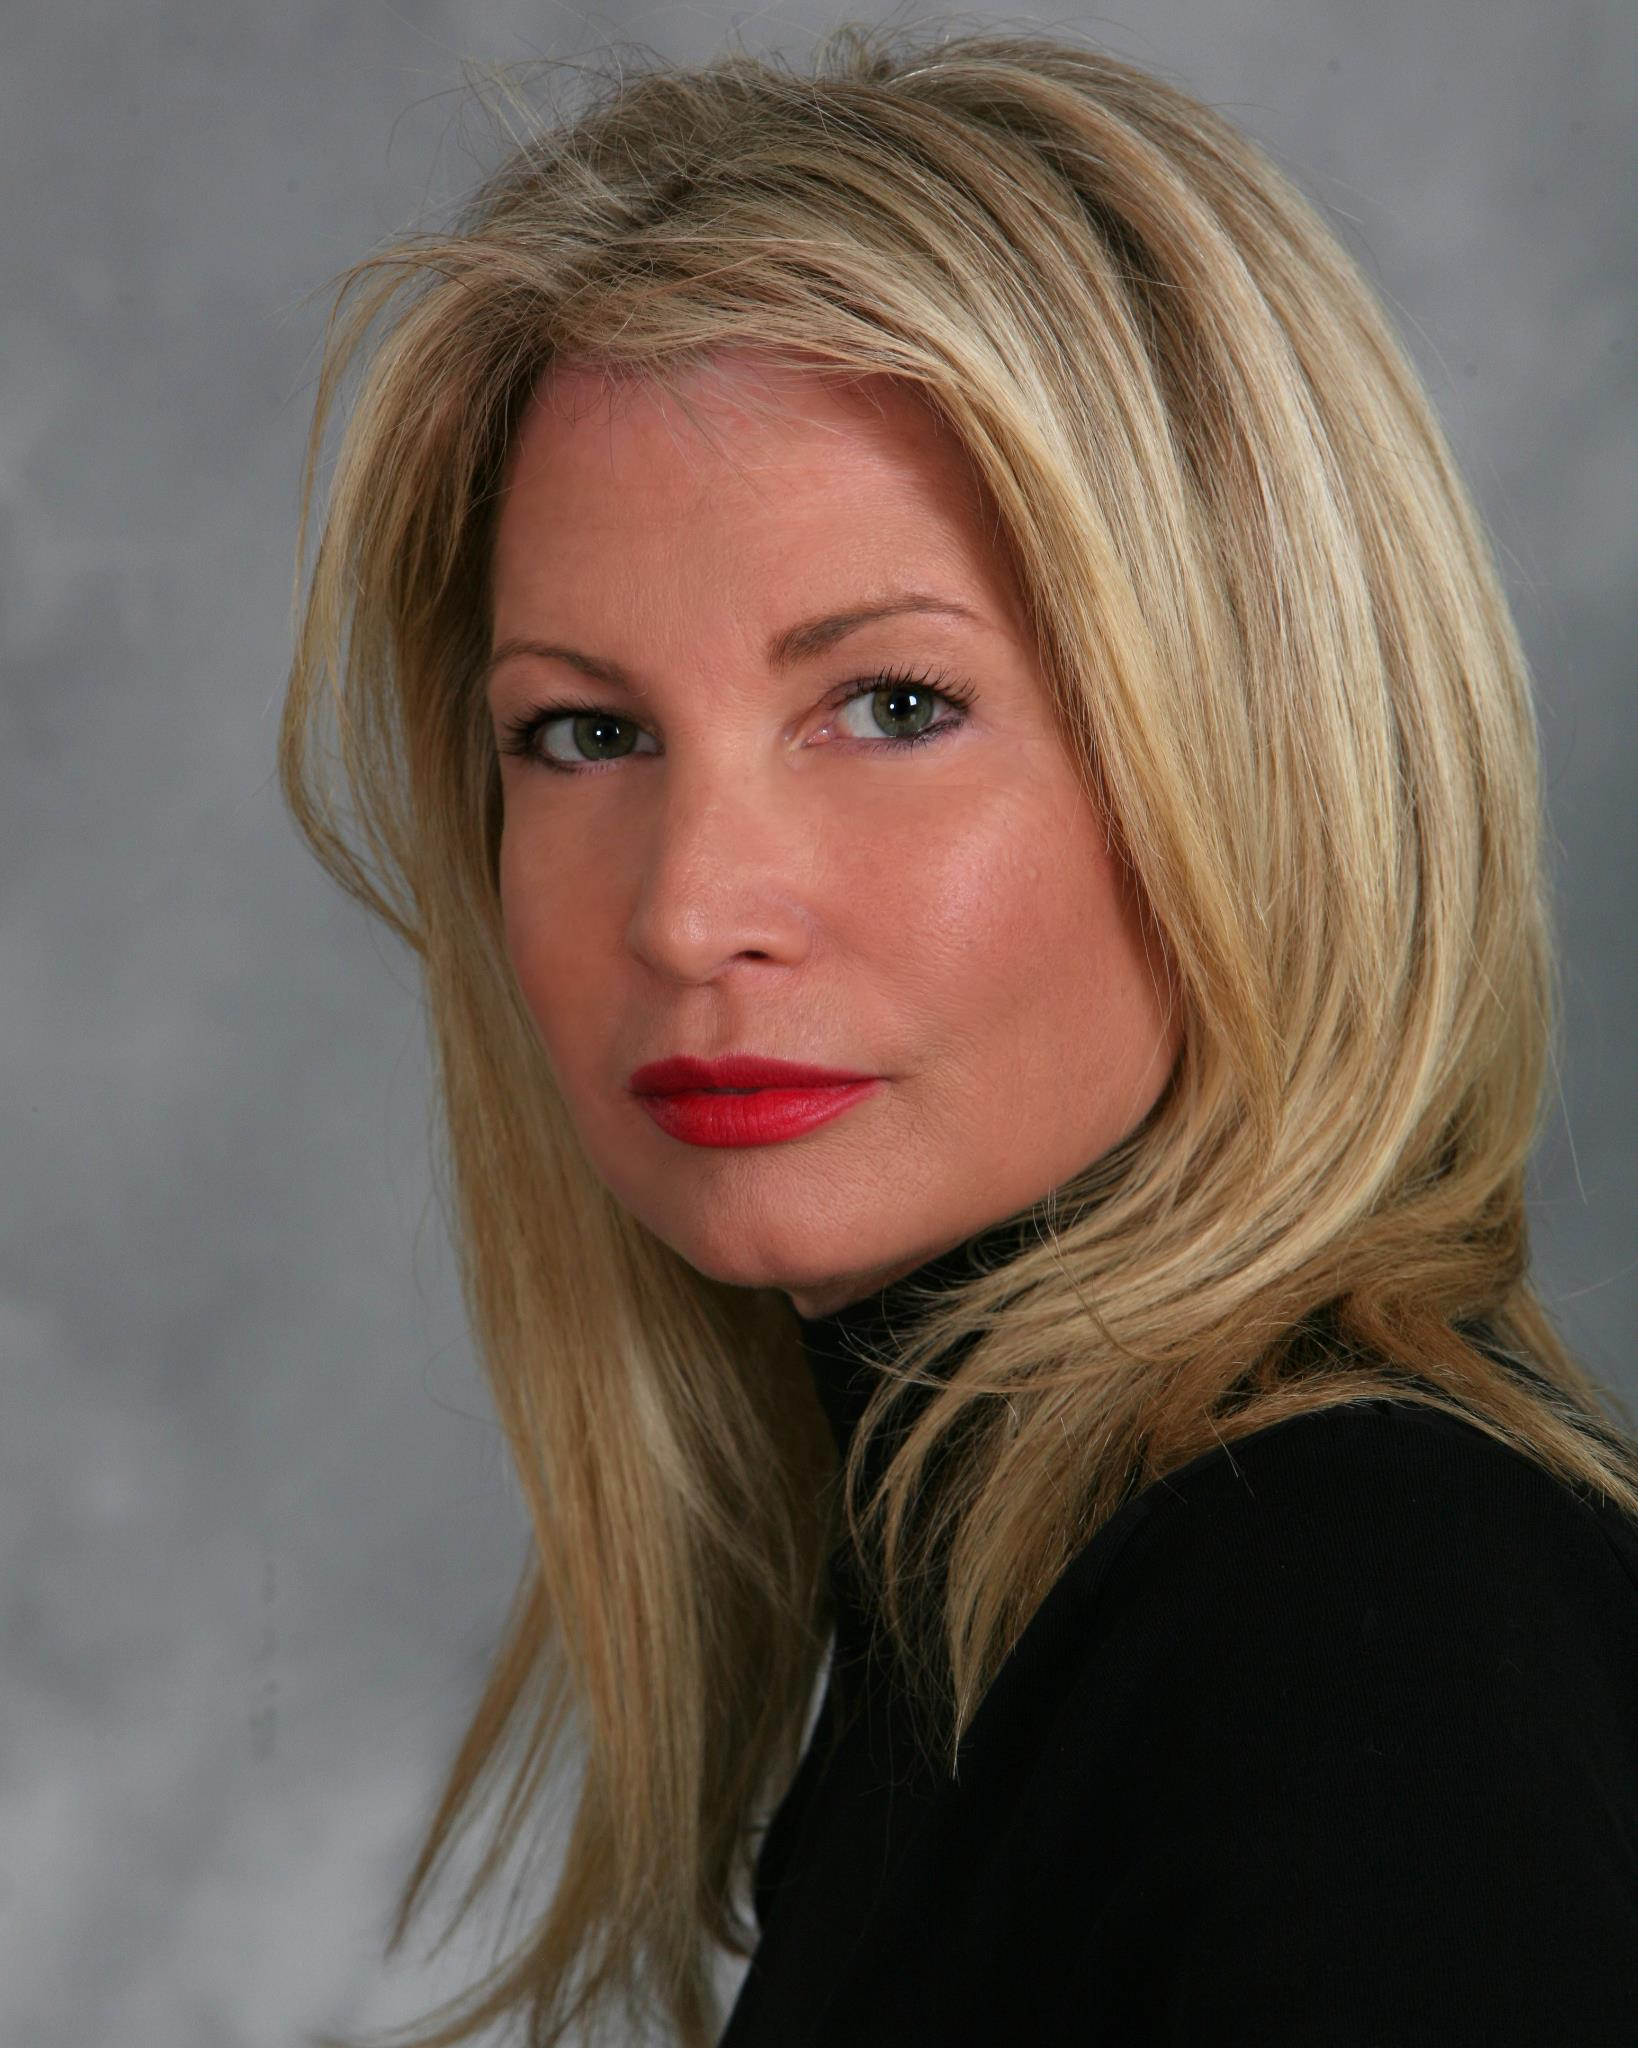 Katherine Fugate Net Worth